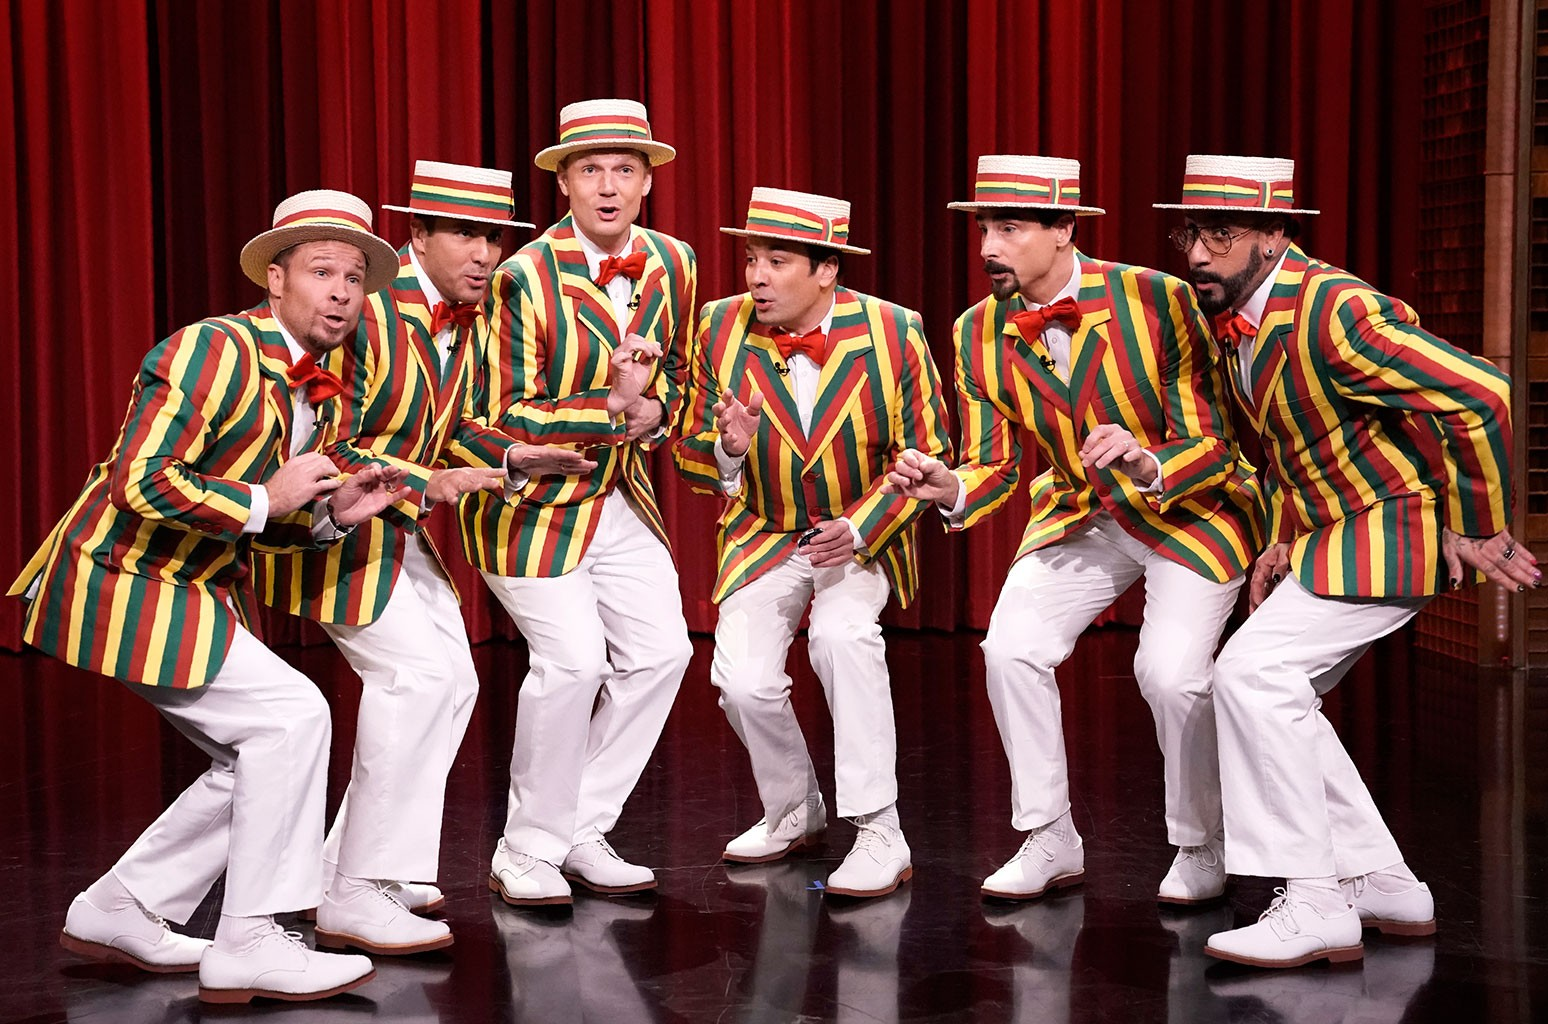 Backstreet Boys and Jimmy Fallon